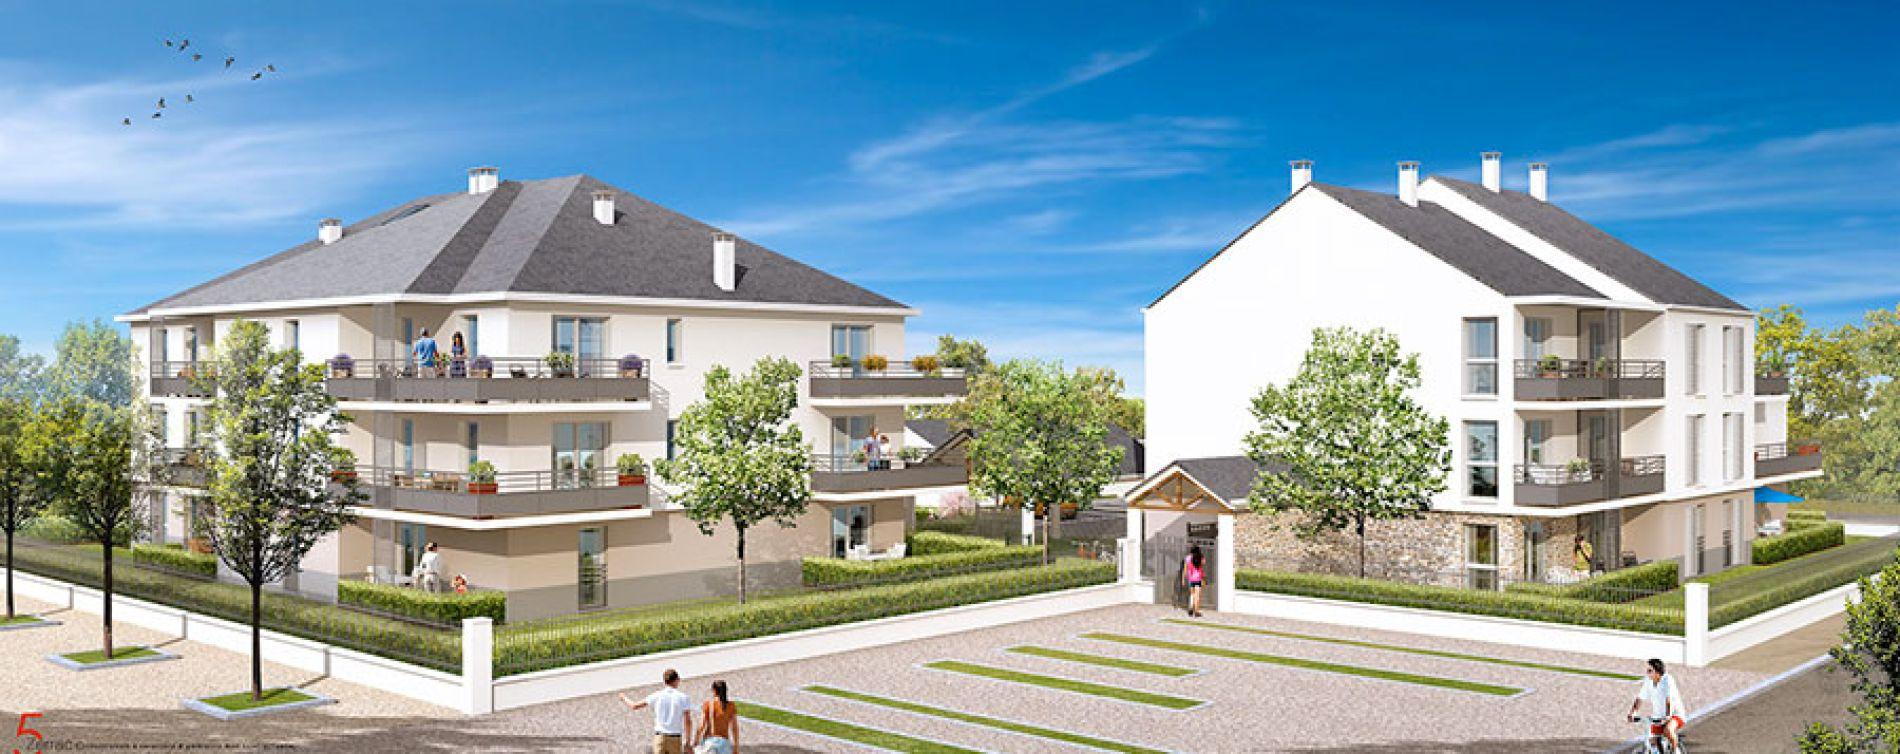 Entre ville et nature 2 gly programme immobilier neuf n for Piscine entre 2 immeubles